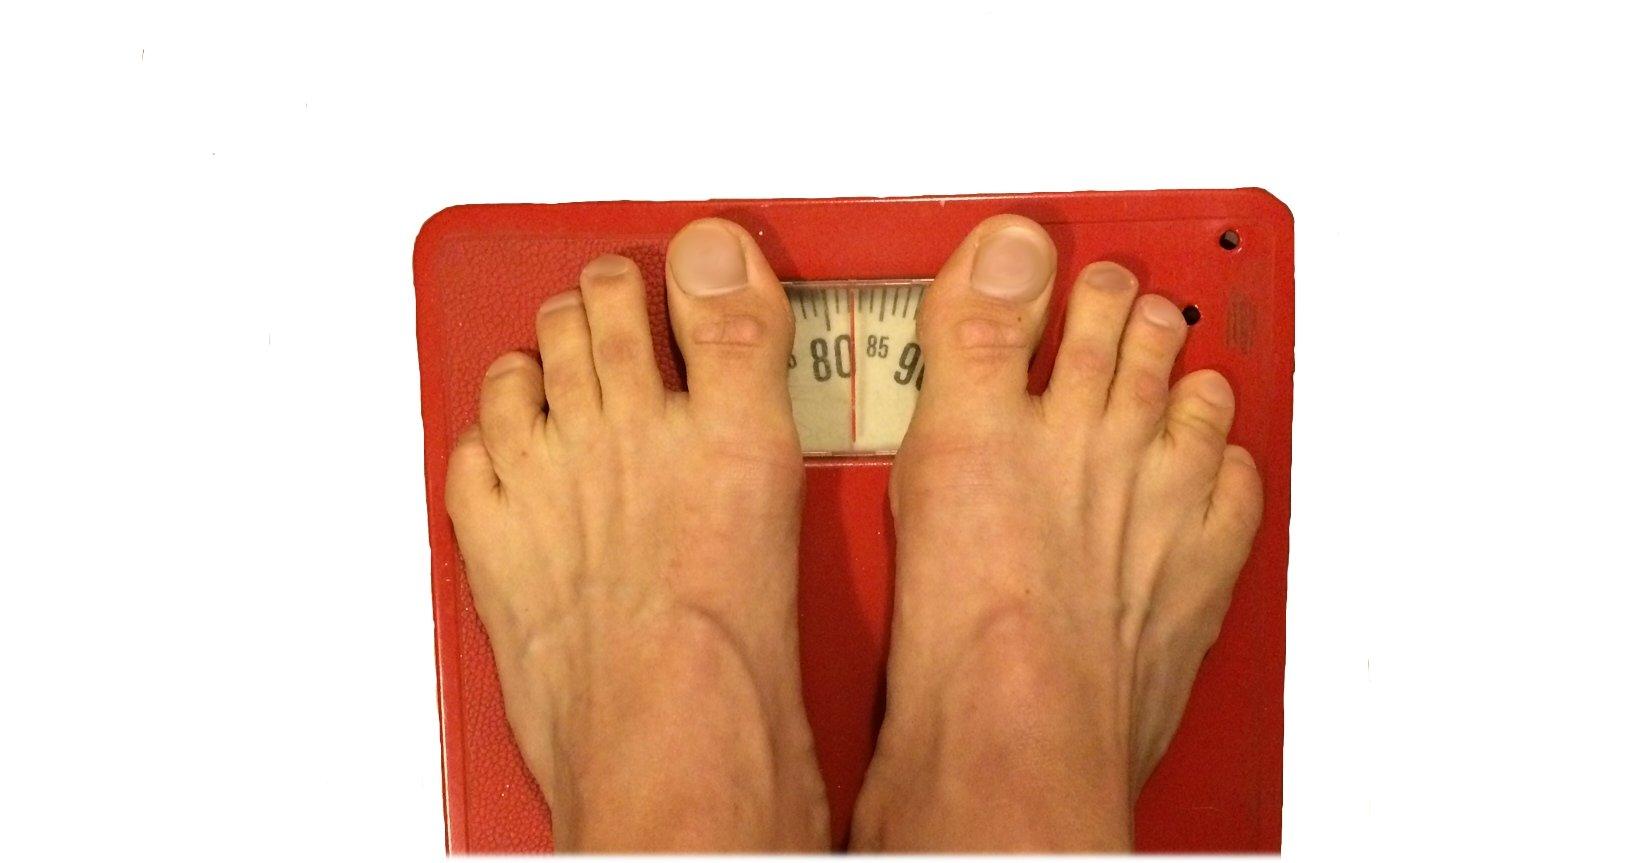 Diete ed esercizi per perdita di peso in condizioni di casa di video